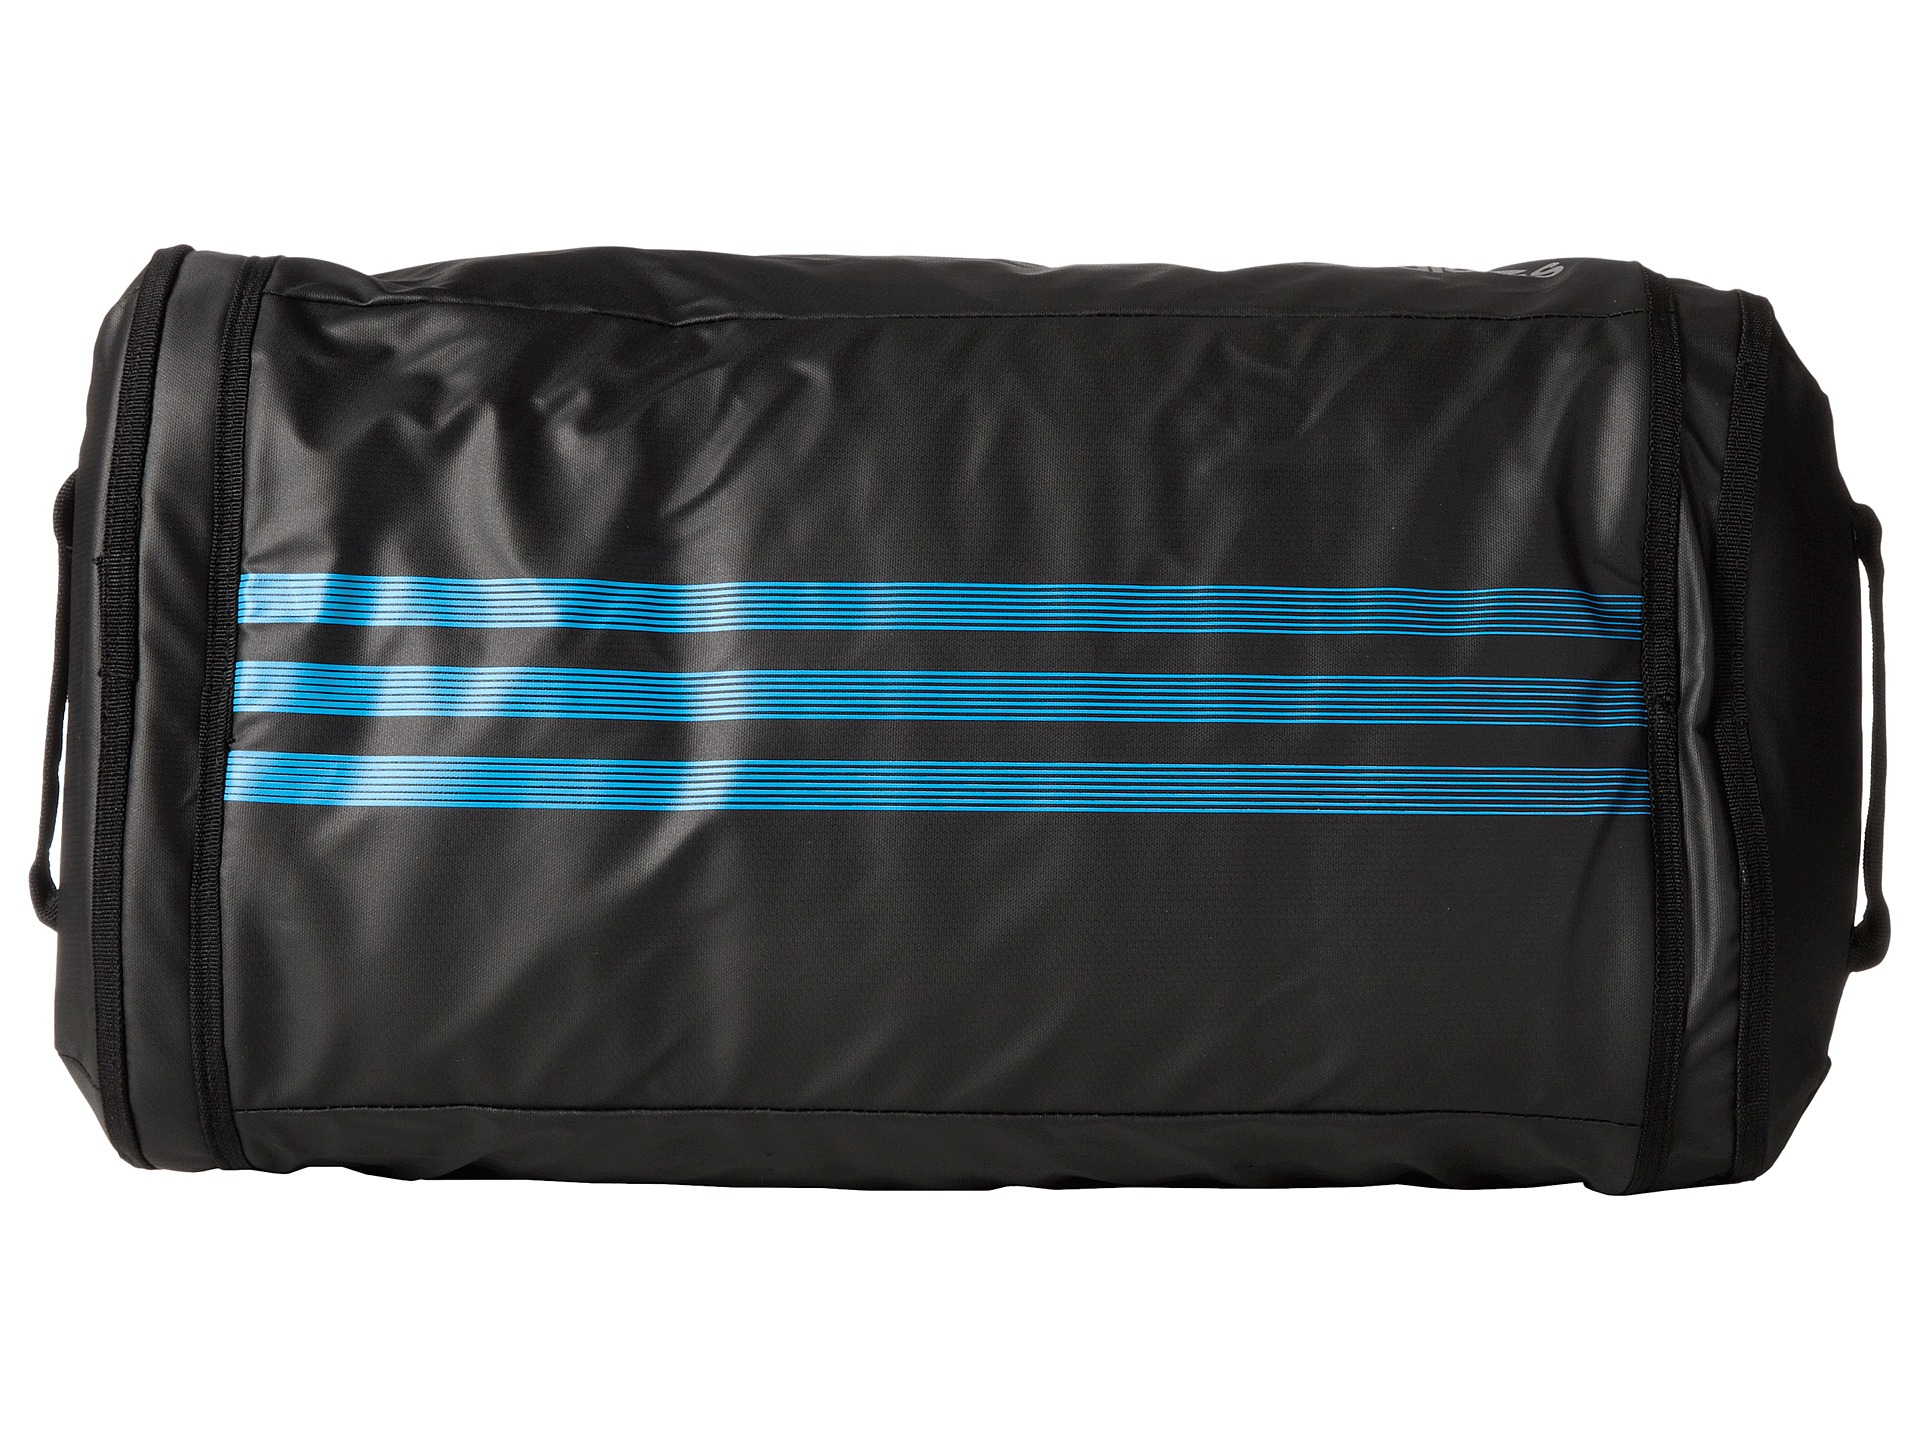 fd5c4dbd980a Lyst - adidas Climaproof Menace Duffel in Blue for Men